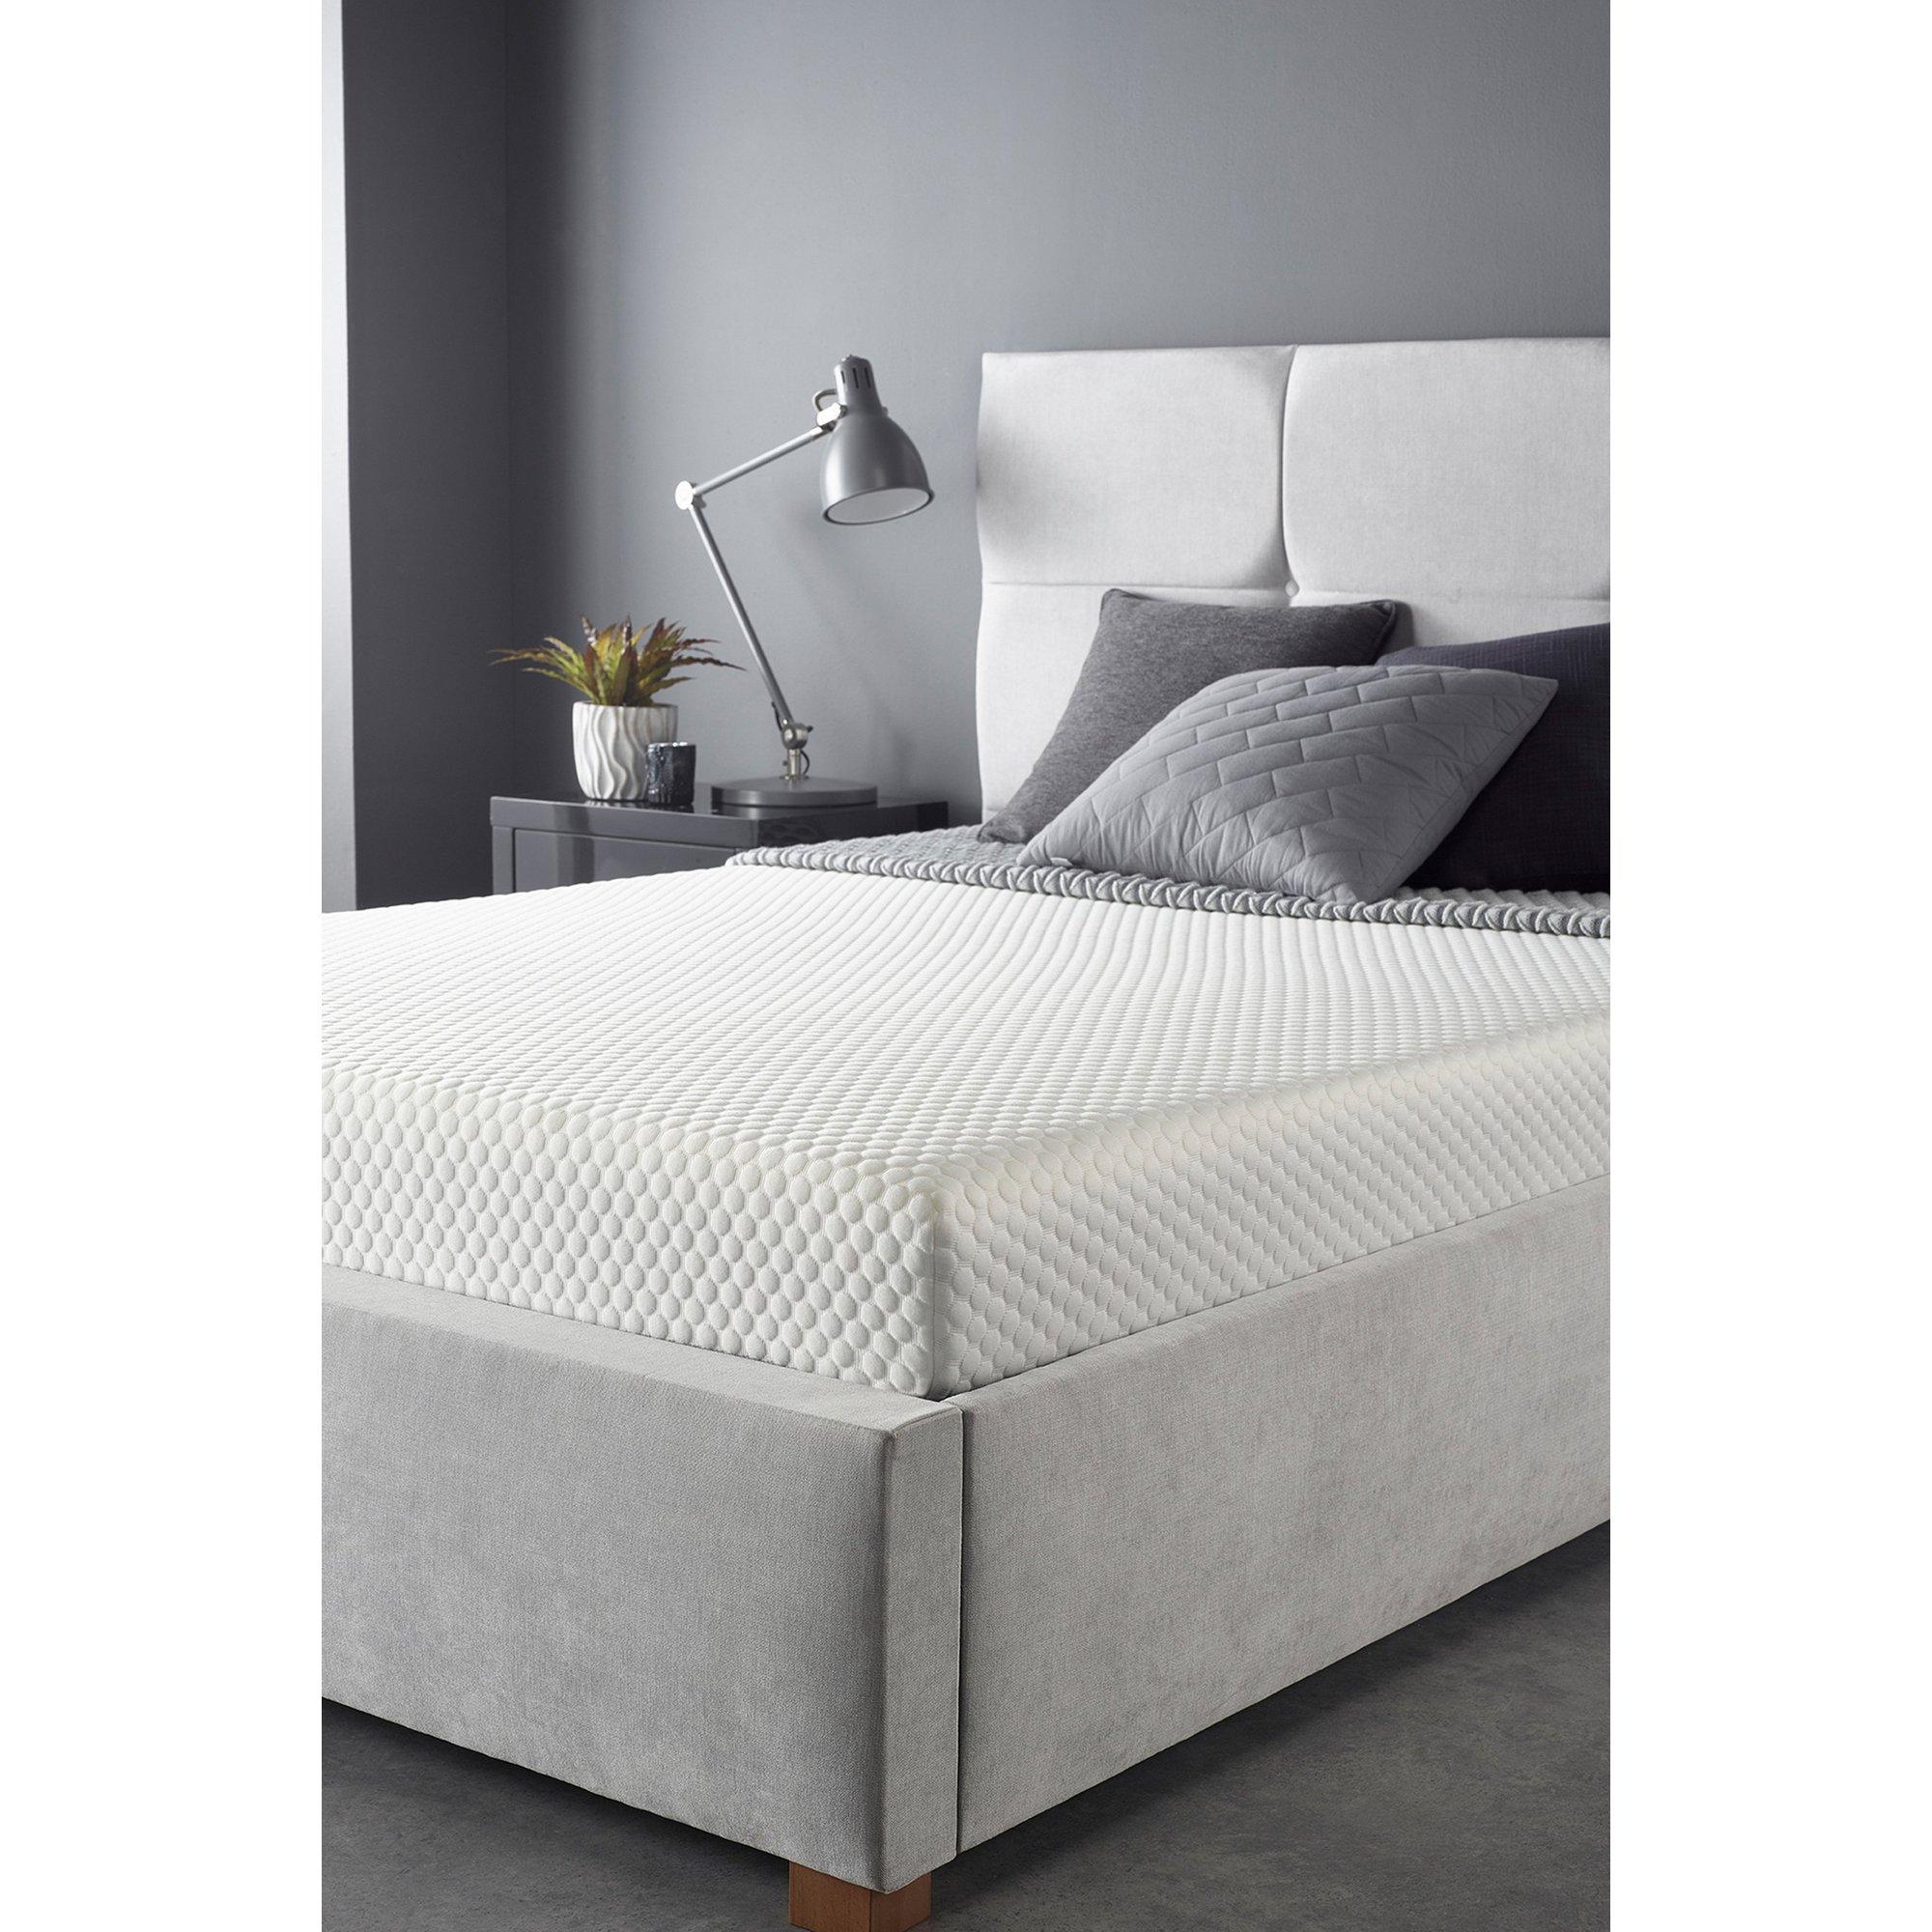 Image of Catherine Lansfield Eco Sleep Mattress